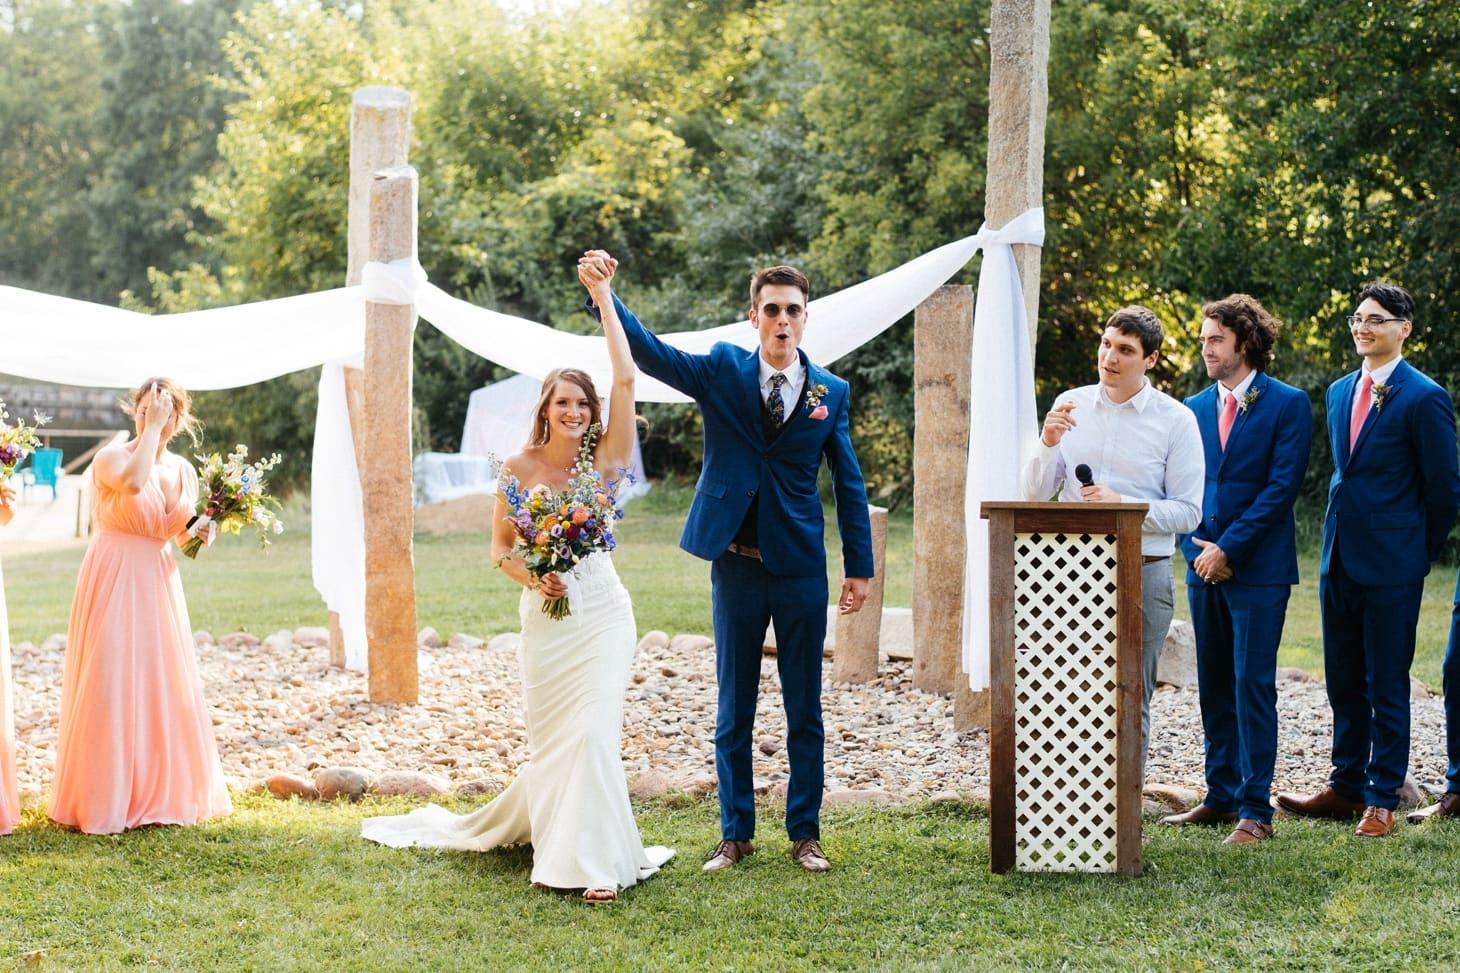 wedding exit at harvest preserve in iowa city